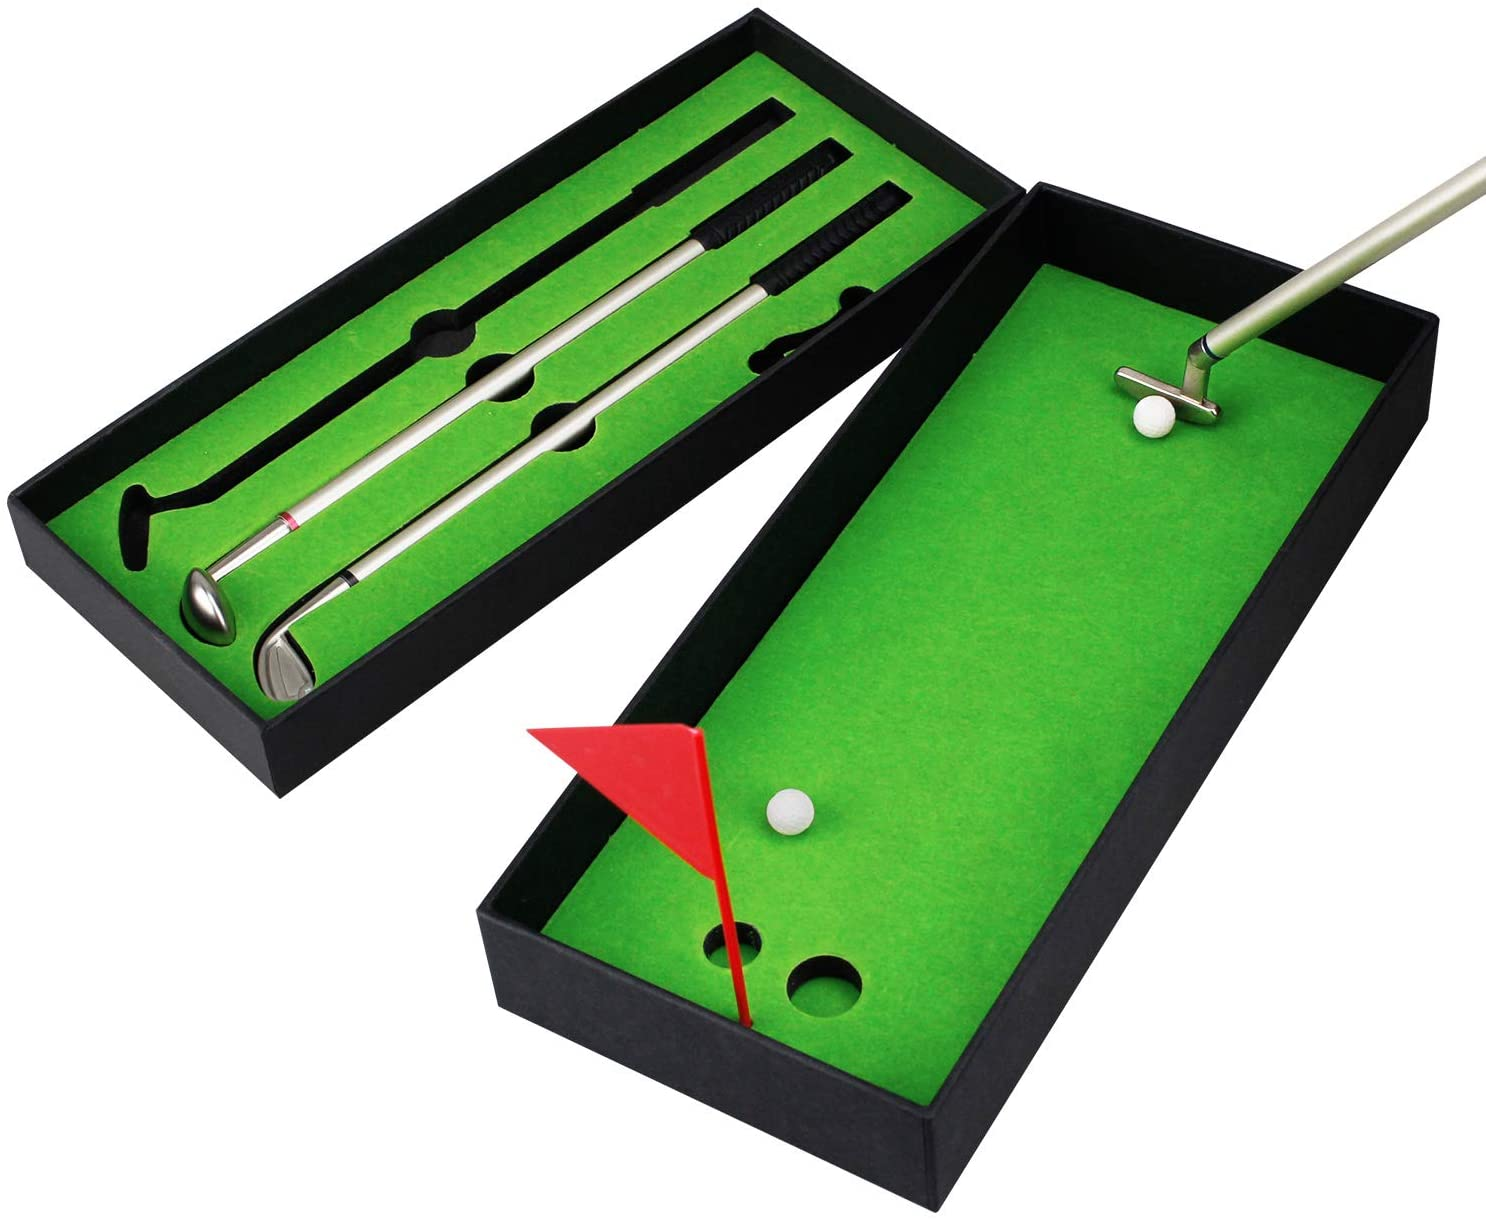 Mini Golf Pen Set Simulated Desktop Golf Course Premium Office Gift Men Ballpoint Tabletop Sports Accessories